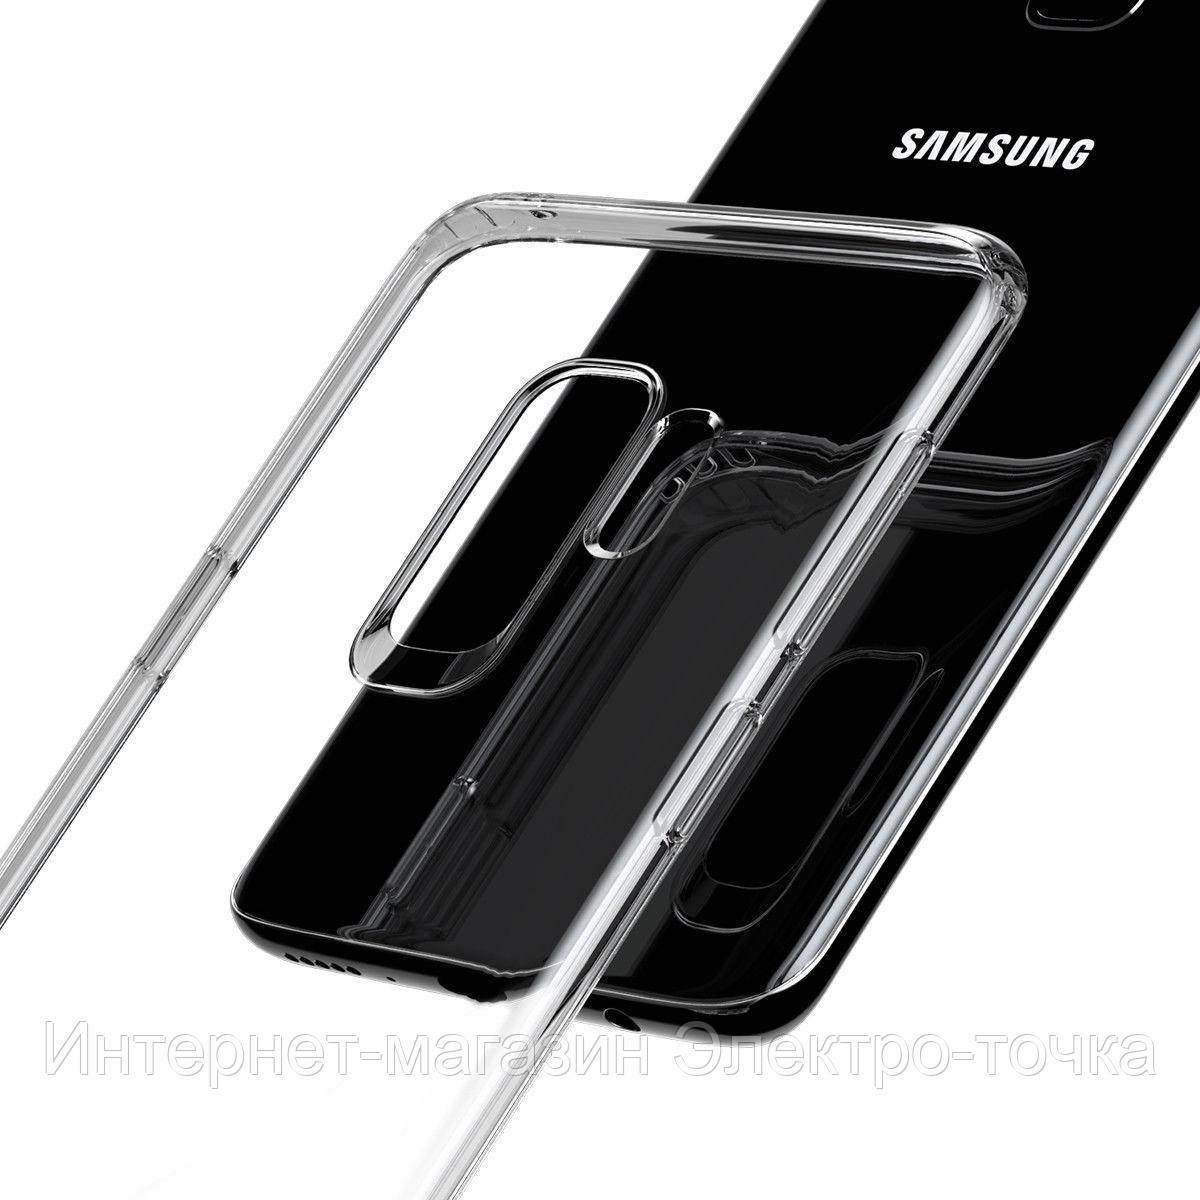 Чехол TPU Baseus Simple Ultrathin для Samsung Galaxy S9